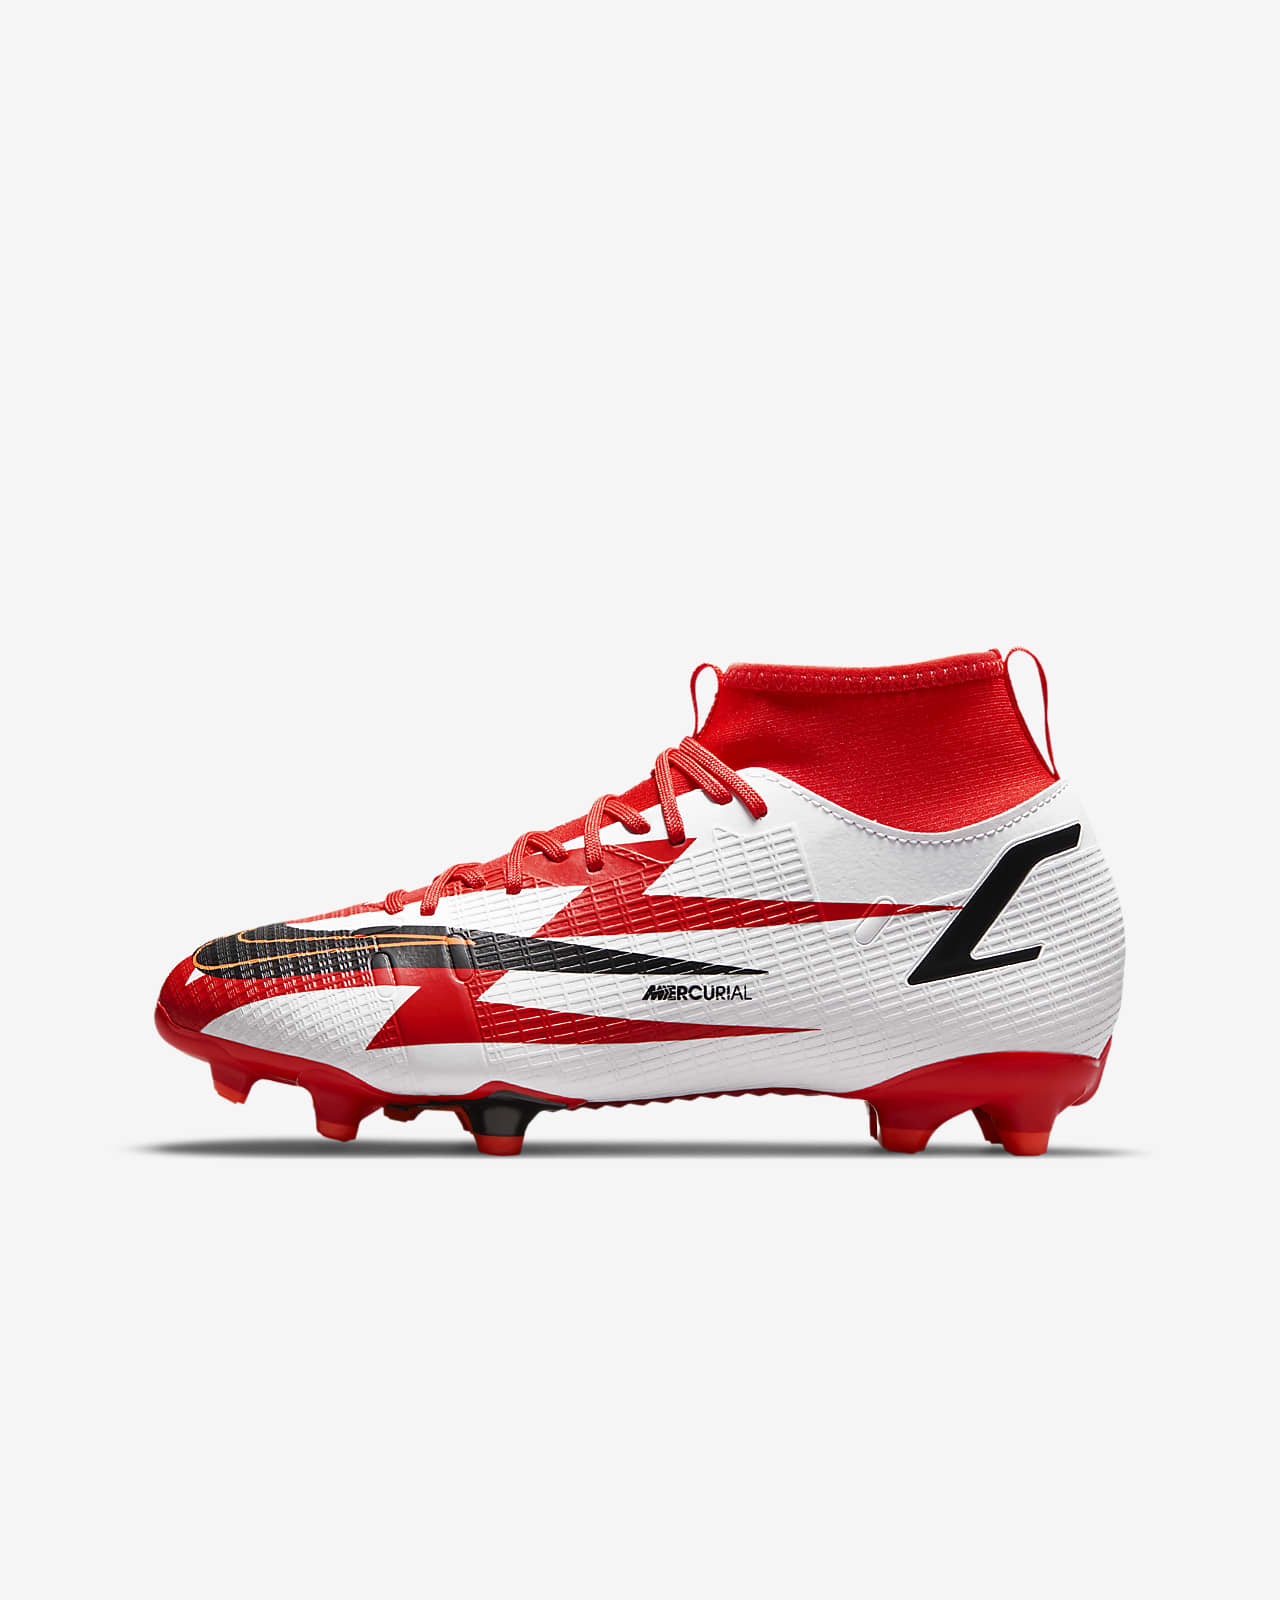 Calzado de fútbol para superficies múltiples para niños talla pequeña/grande Nike Jr. Mercurial Superfly 8 Academy CR7 MG